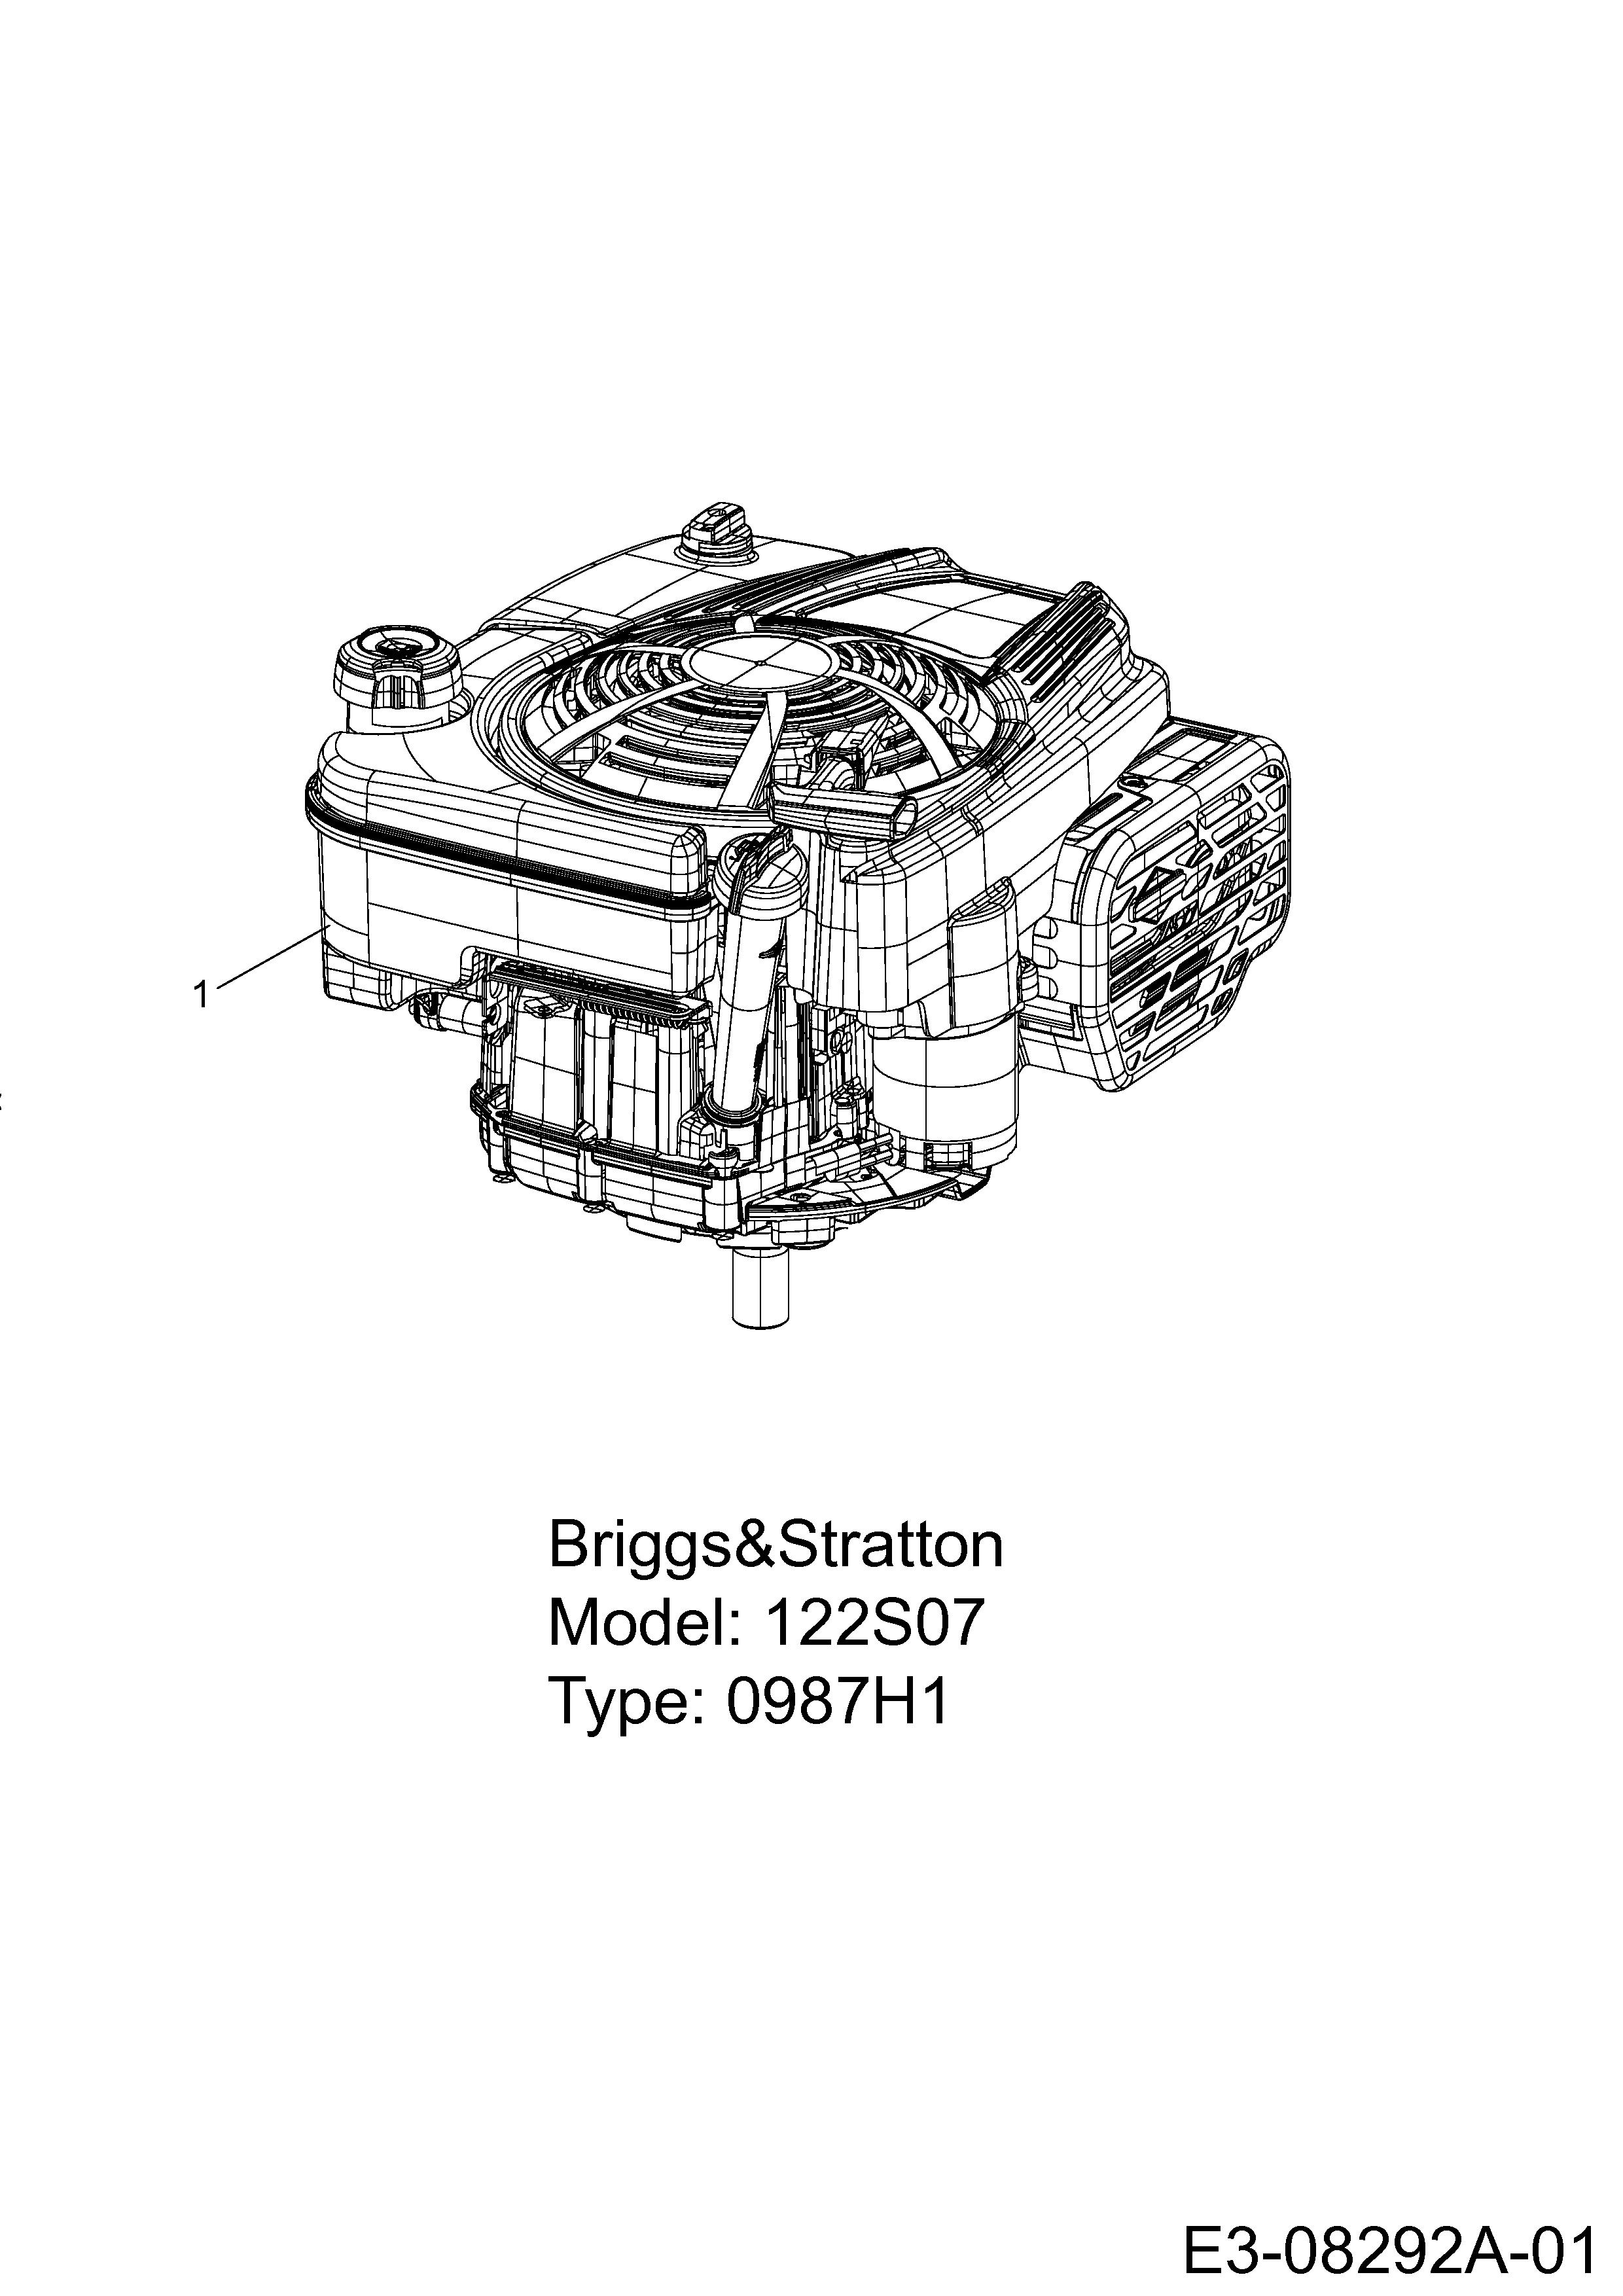 wolf garten scooter mini motor briggs stratton. Black Bedroom Furniture Sets. Home Design Ideas